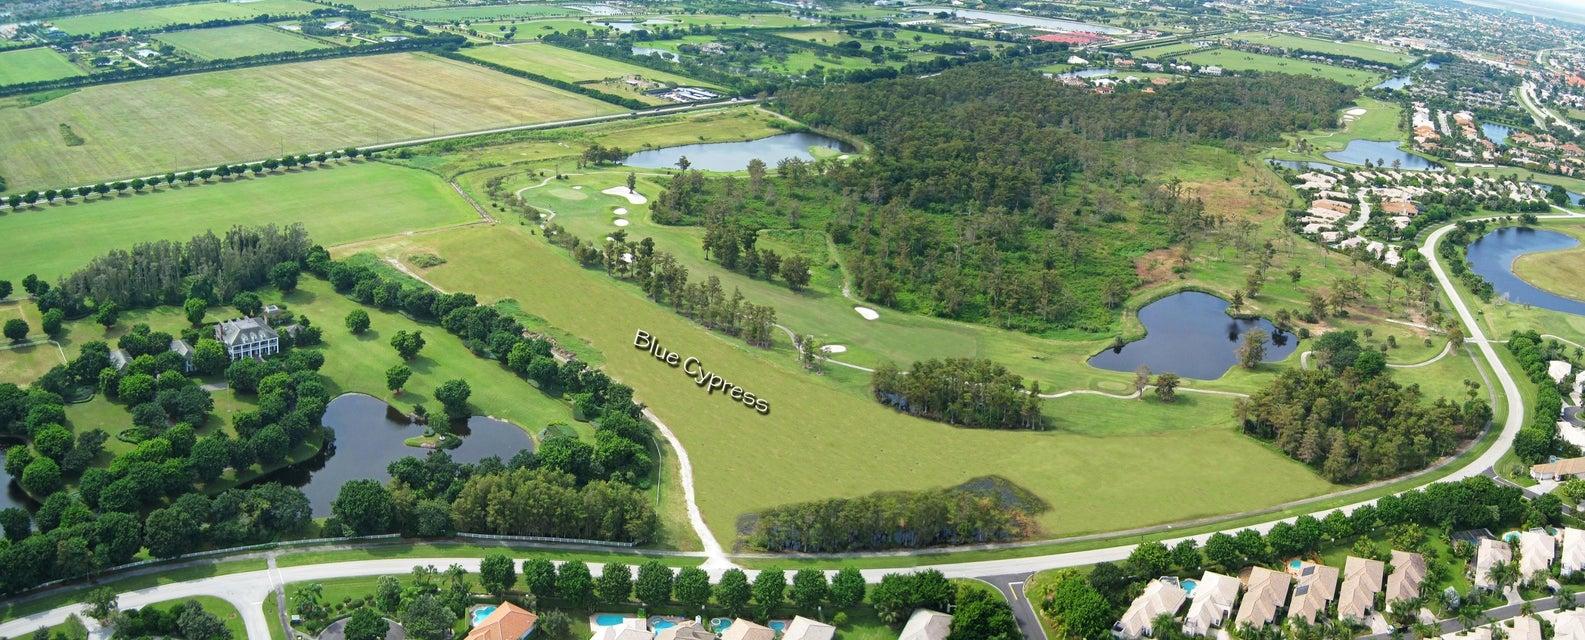 Single Family Home for Sale at 3061 Blue Cypress Lane 3061 Blue Cypress Lane Wellington, Florida 33414 United States